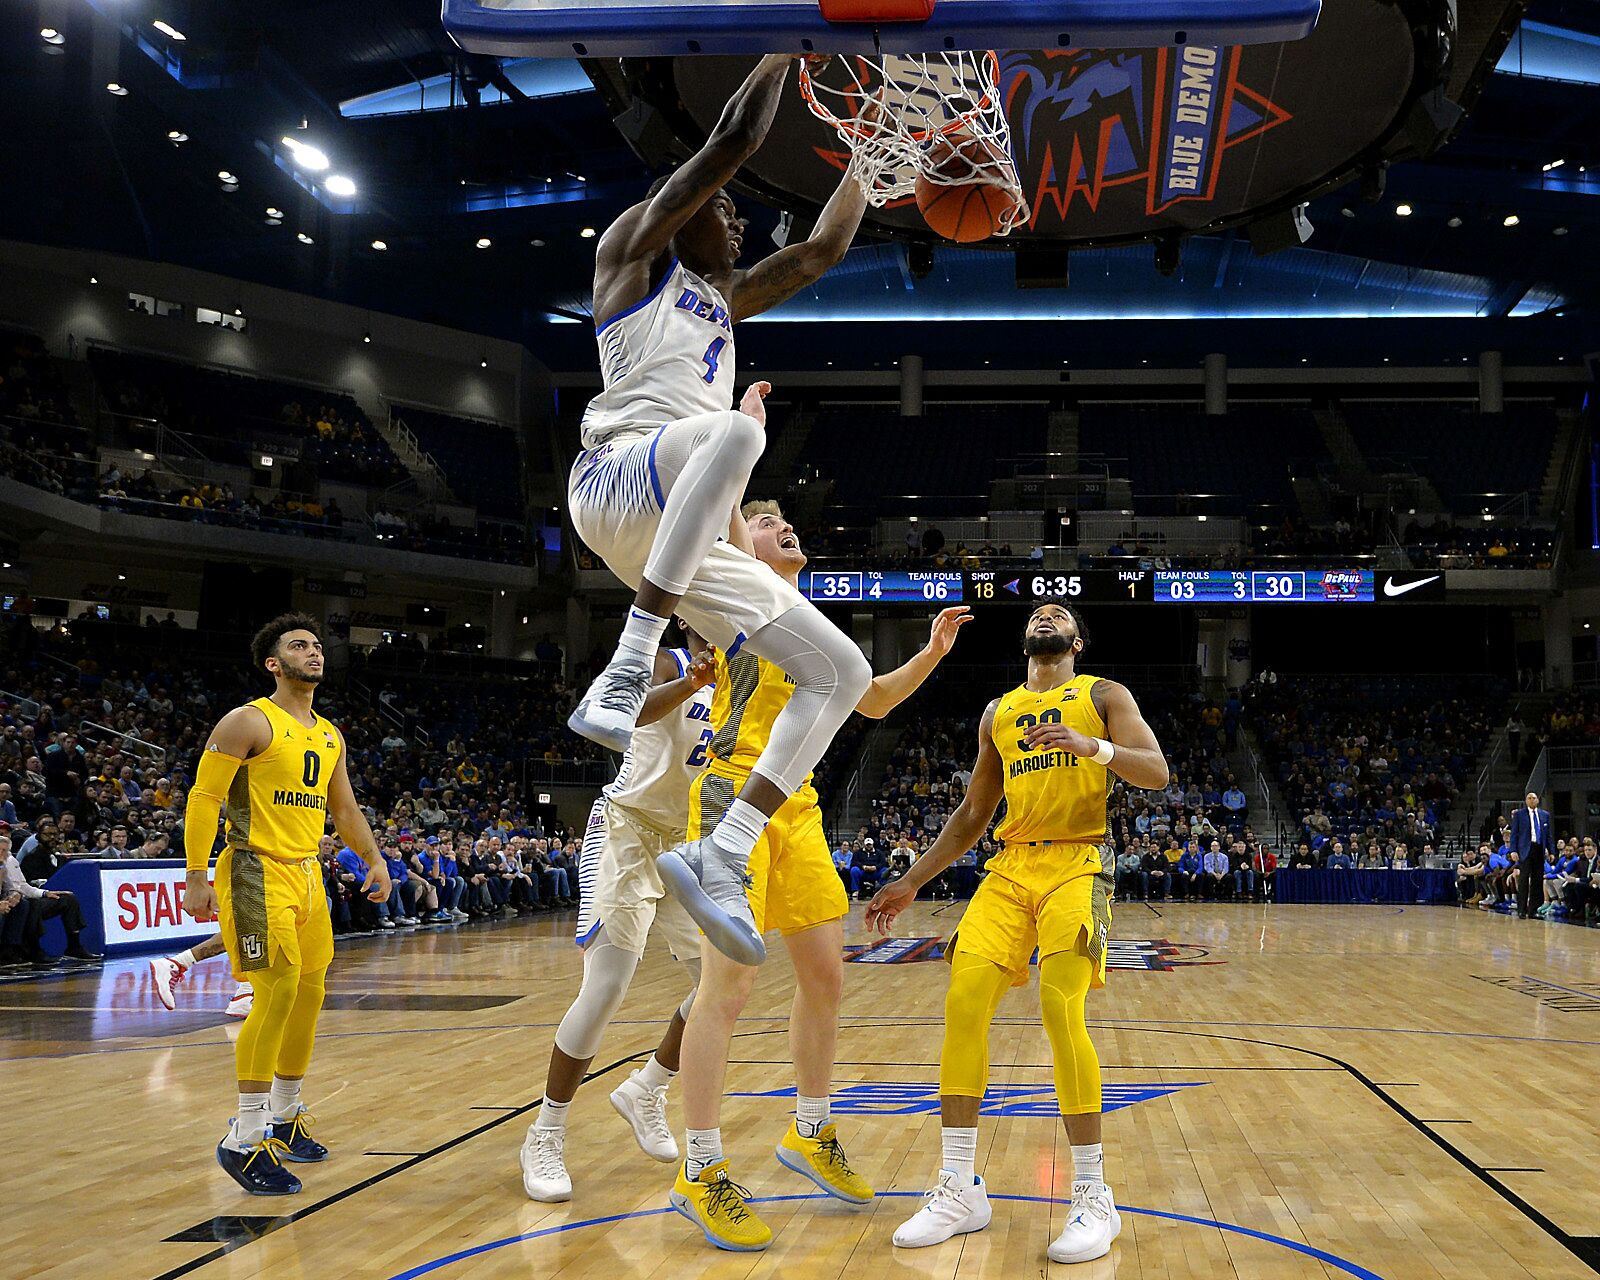 Exterior: Big East Basketball: Way-too-early 2019-20 Preseason Power